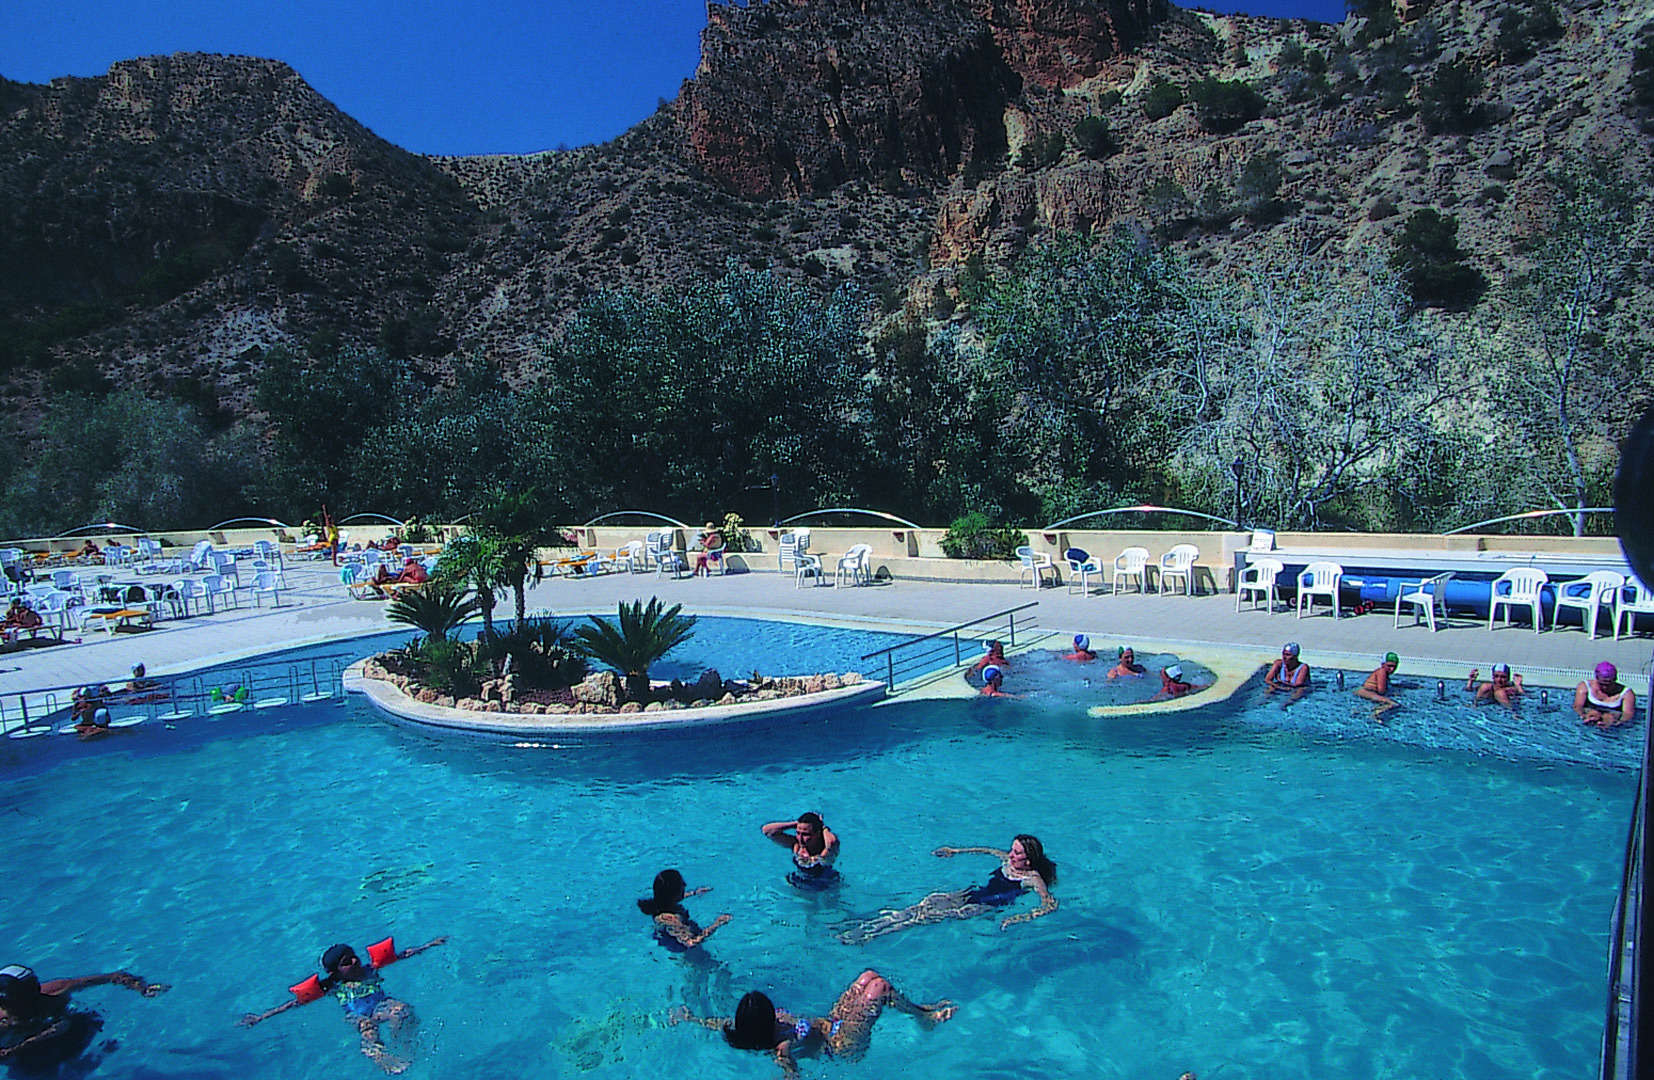 Zona retiro el balneario de archena destino vacacional for Piscina archena